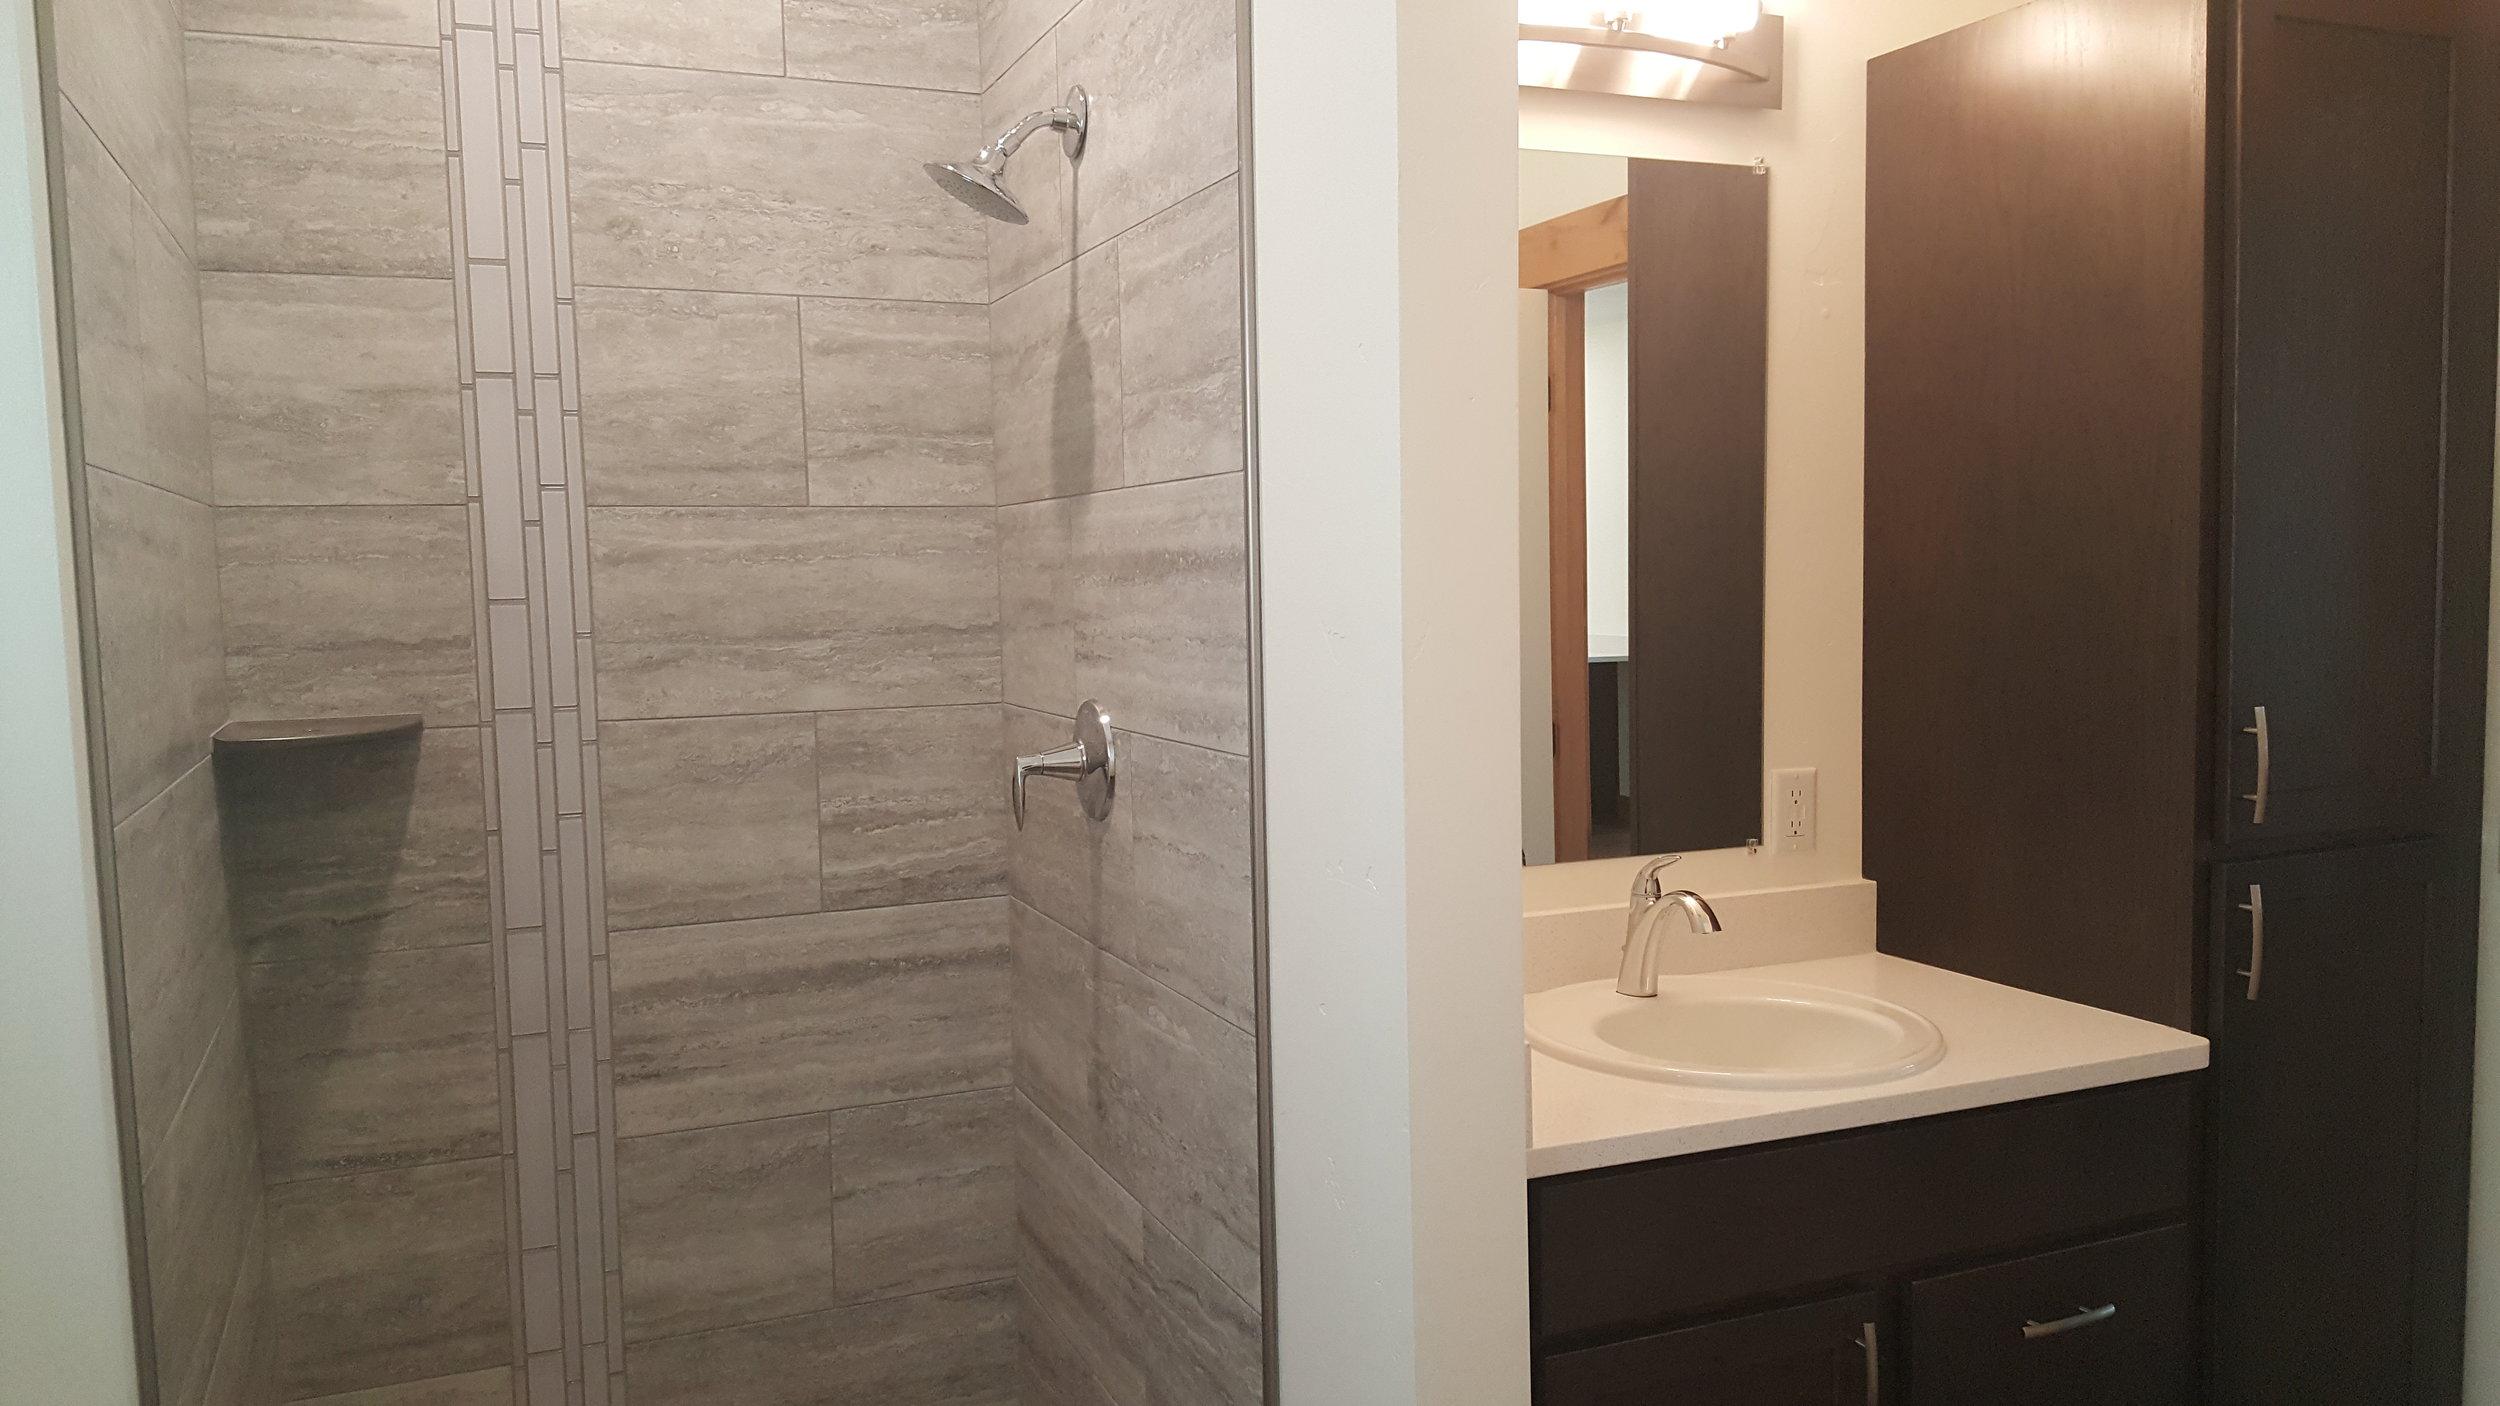 828 Woodford bath 2-shower.jpg